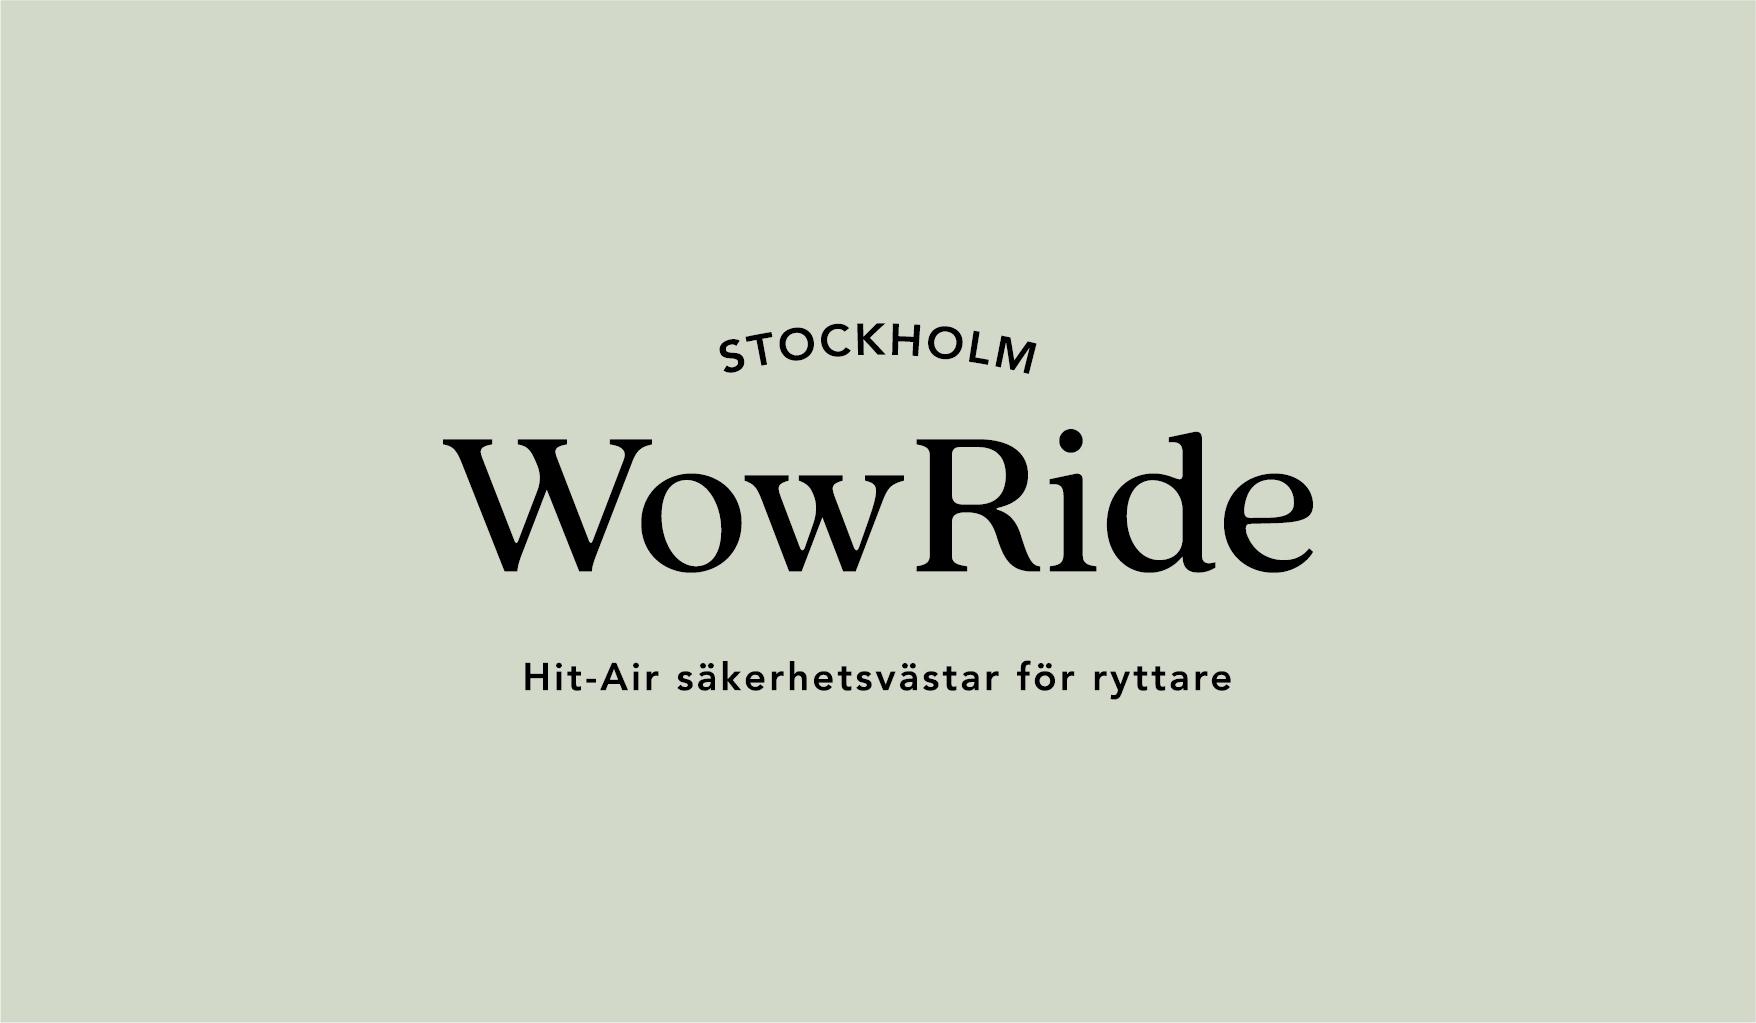 MalinStromblad_WowRide_logotyp.jpg